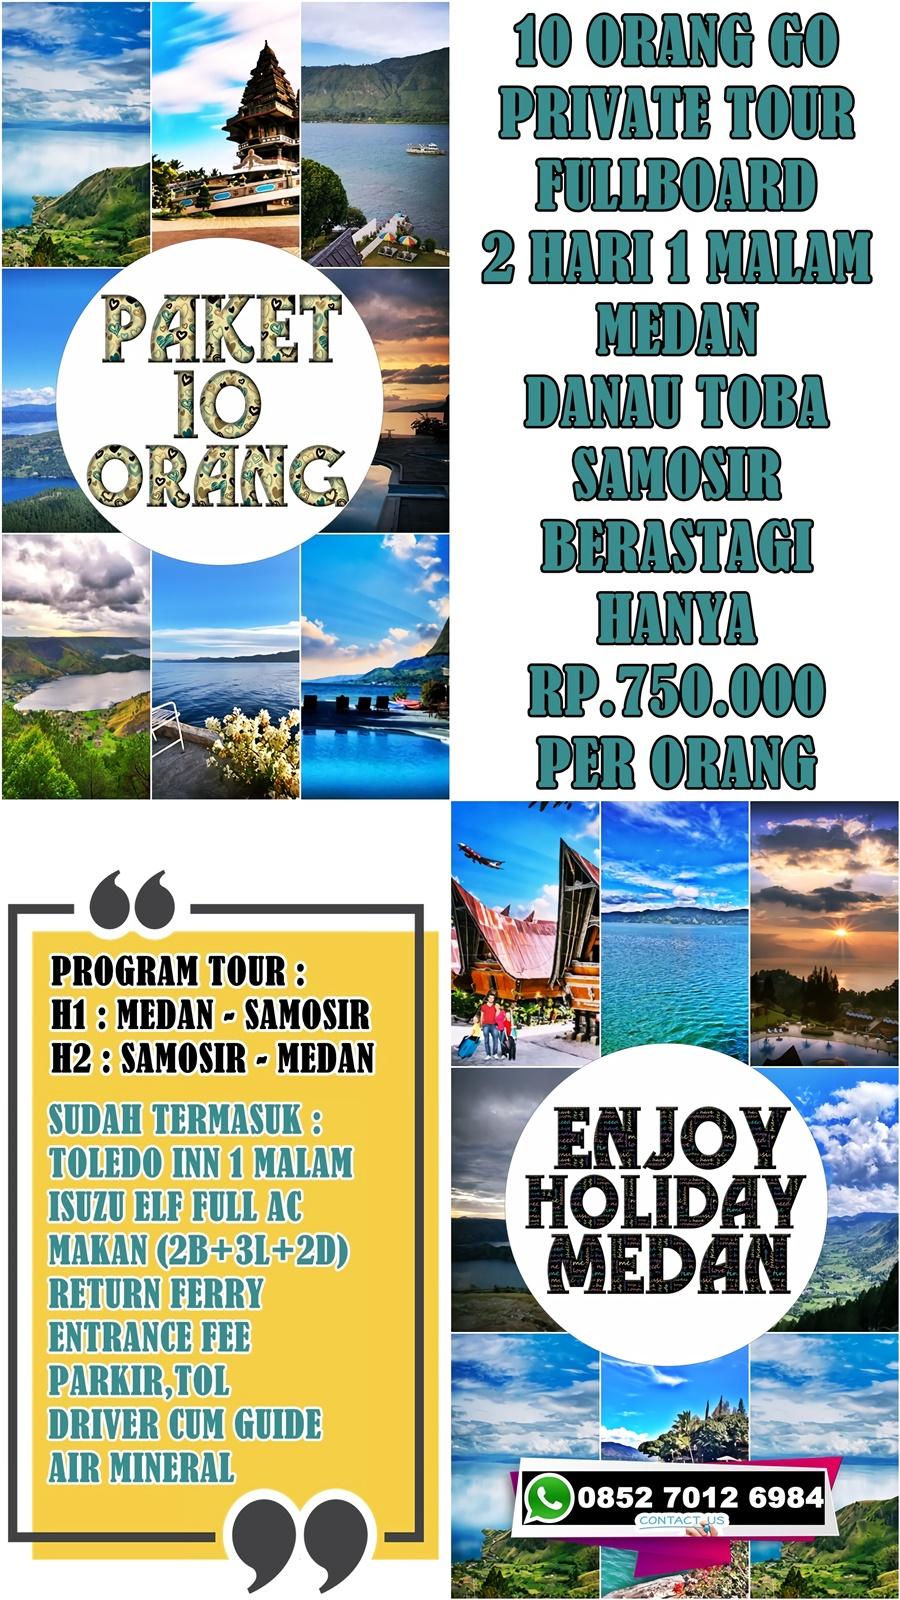 http://www.laketobatourpackages.com/2021/05/open-trip-danau-toba.html